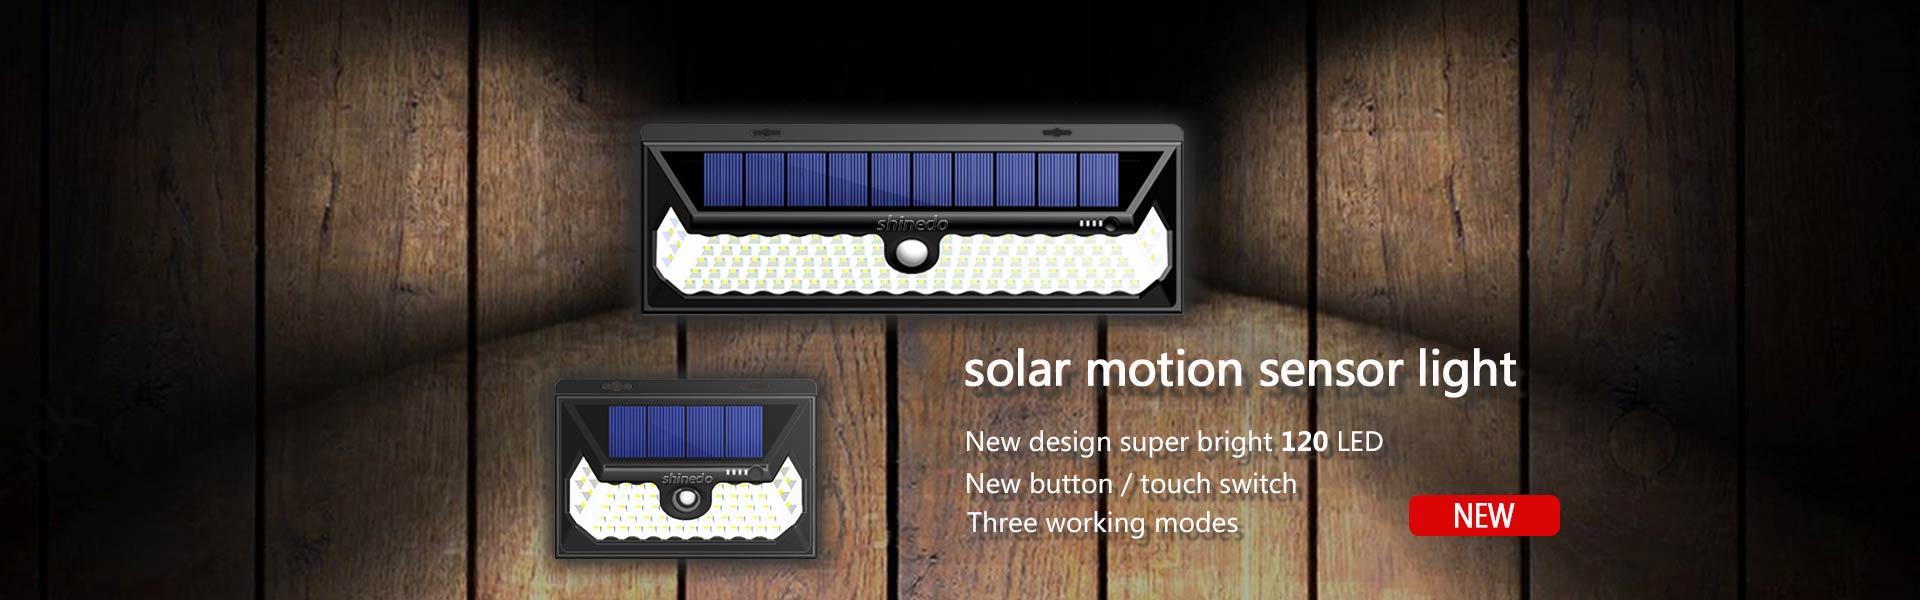 Solar Motion Sensor Light Manufacturer China